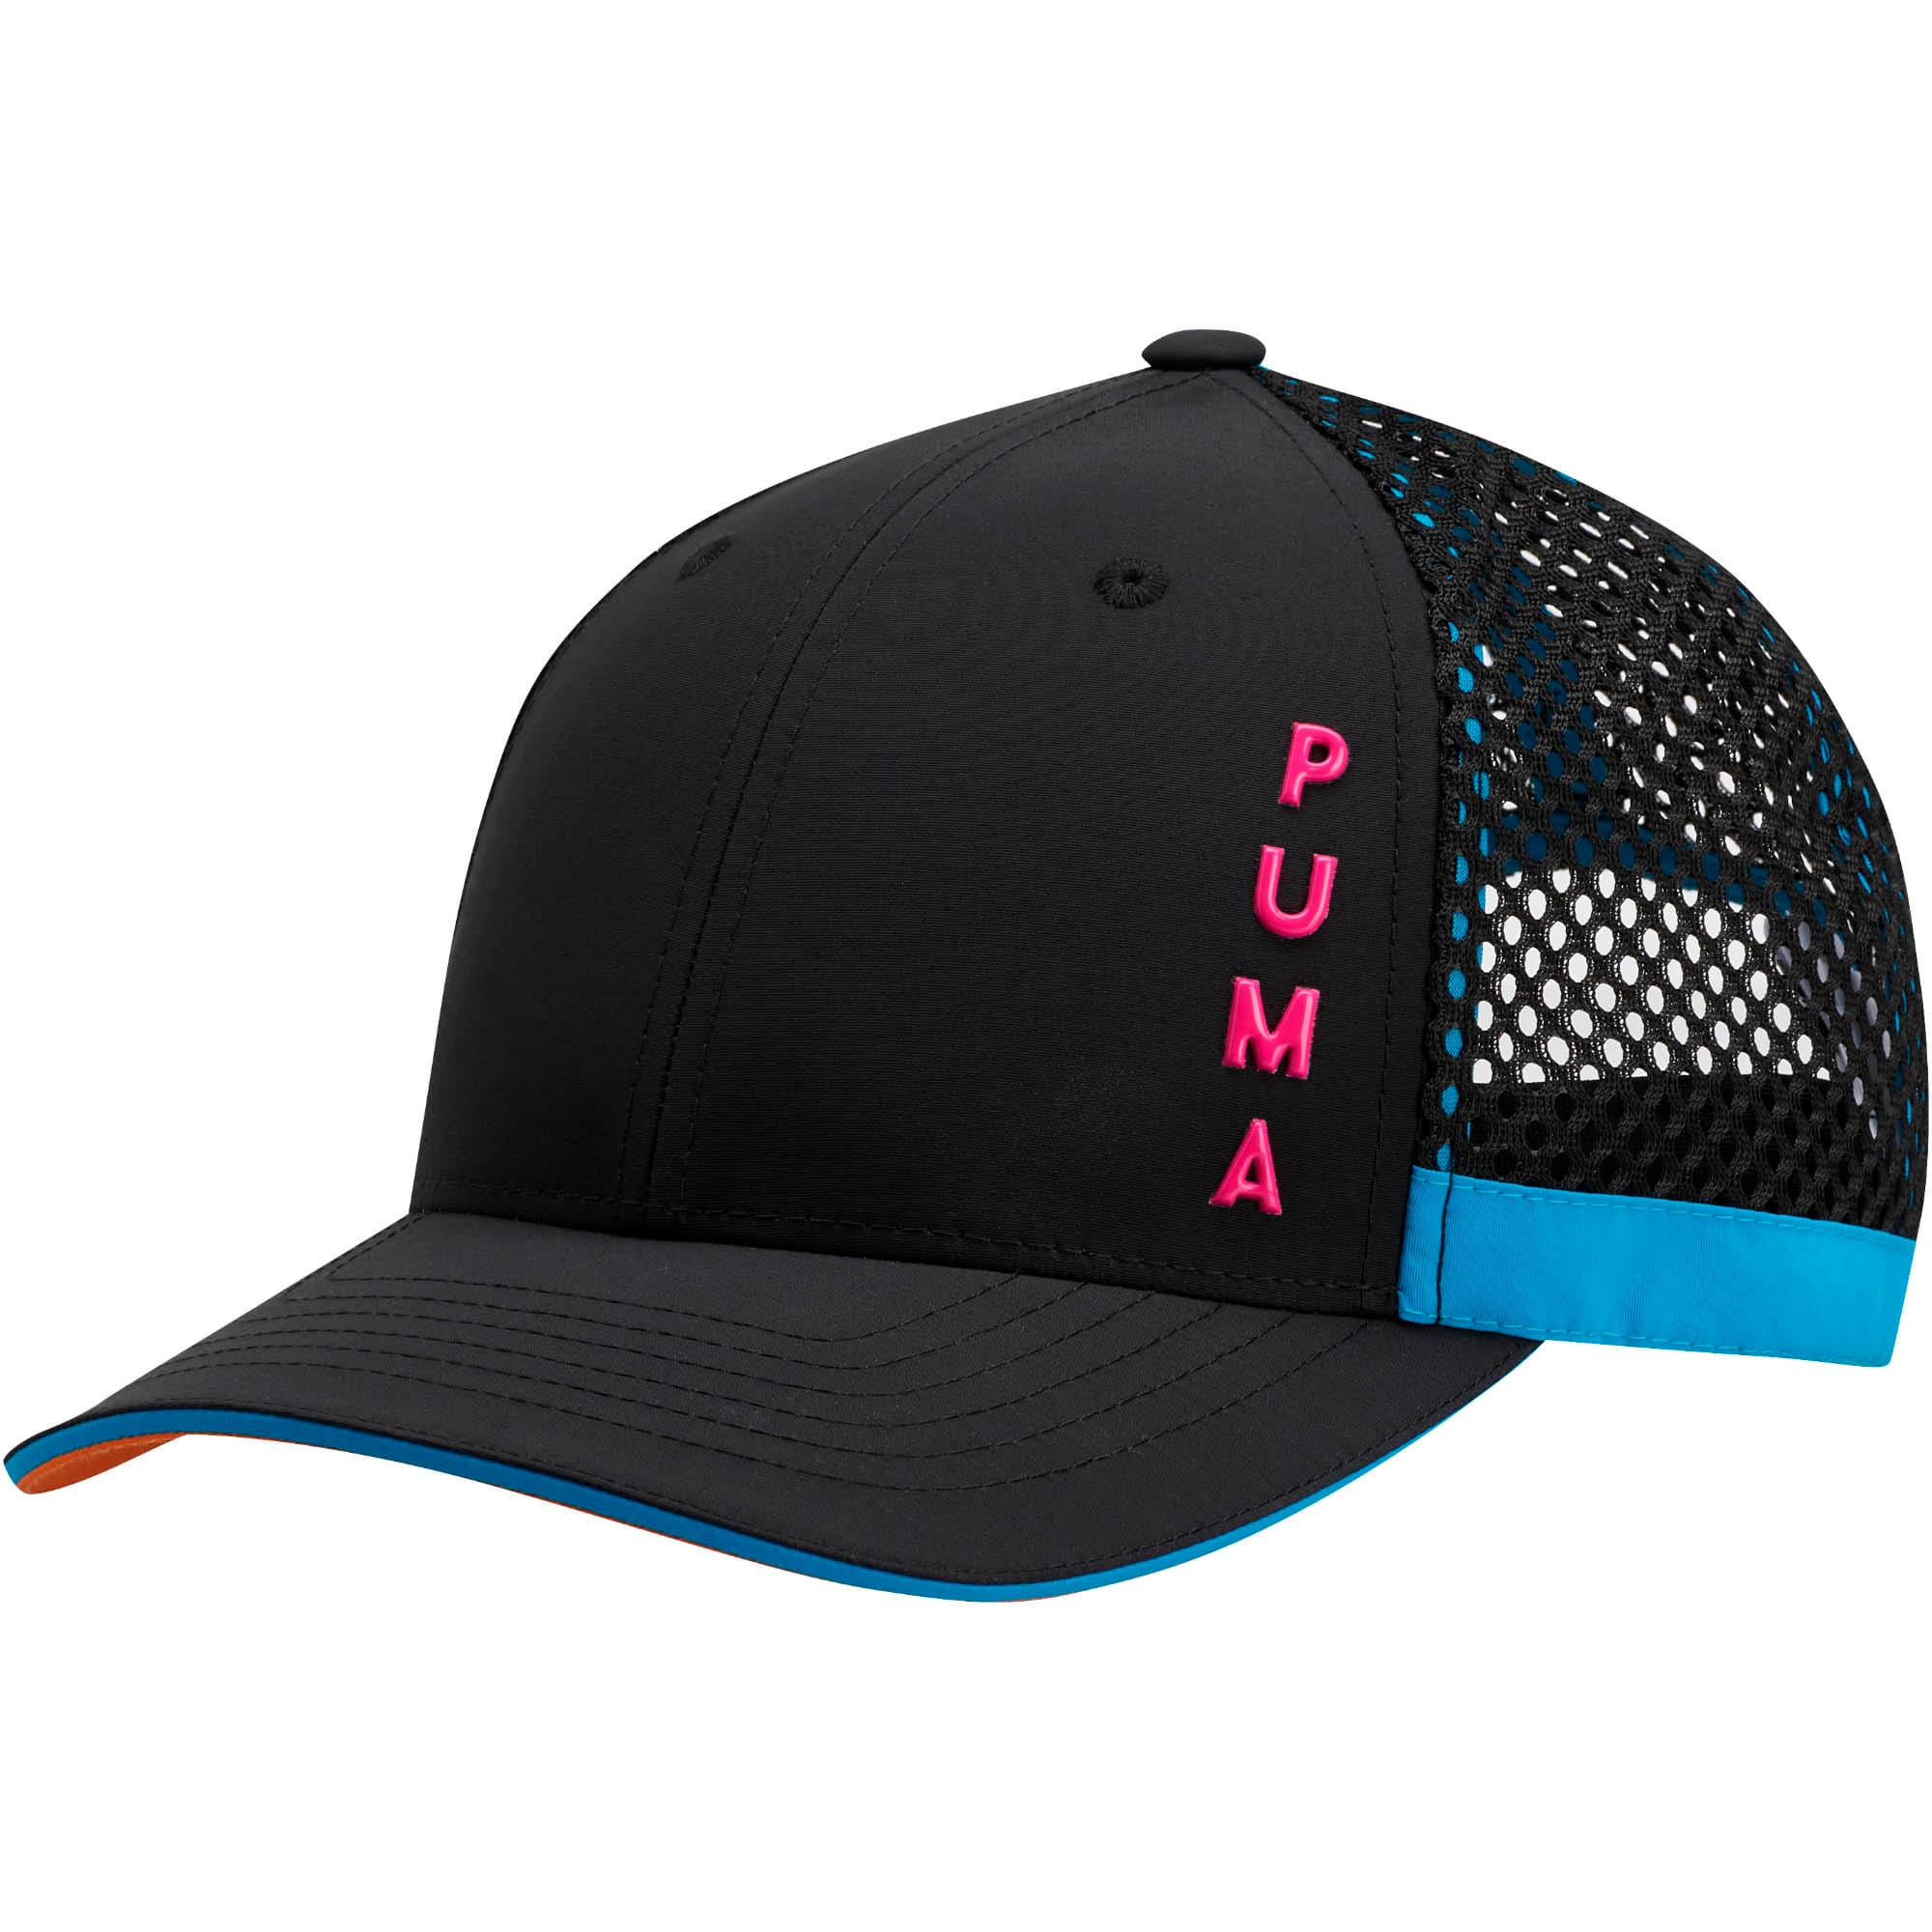 Thumbnail 1 of Upward Performance Women's Adjustable Cap, Black/Multi, medium